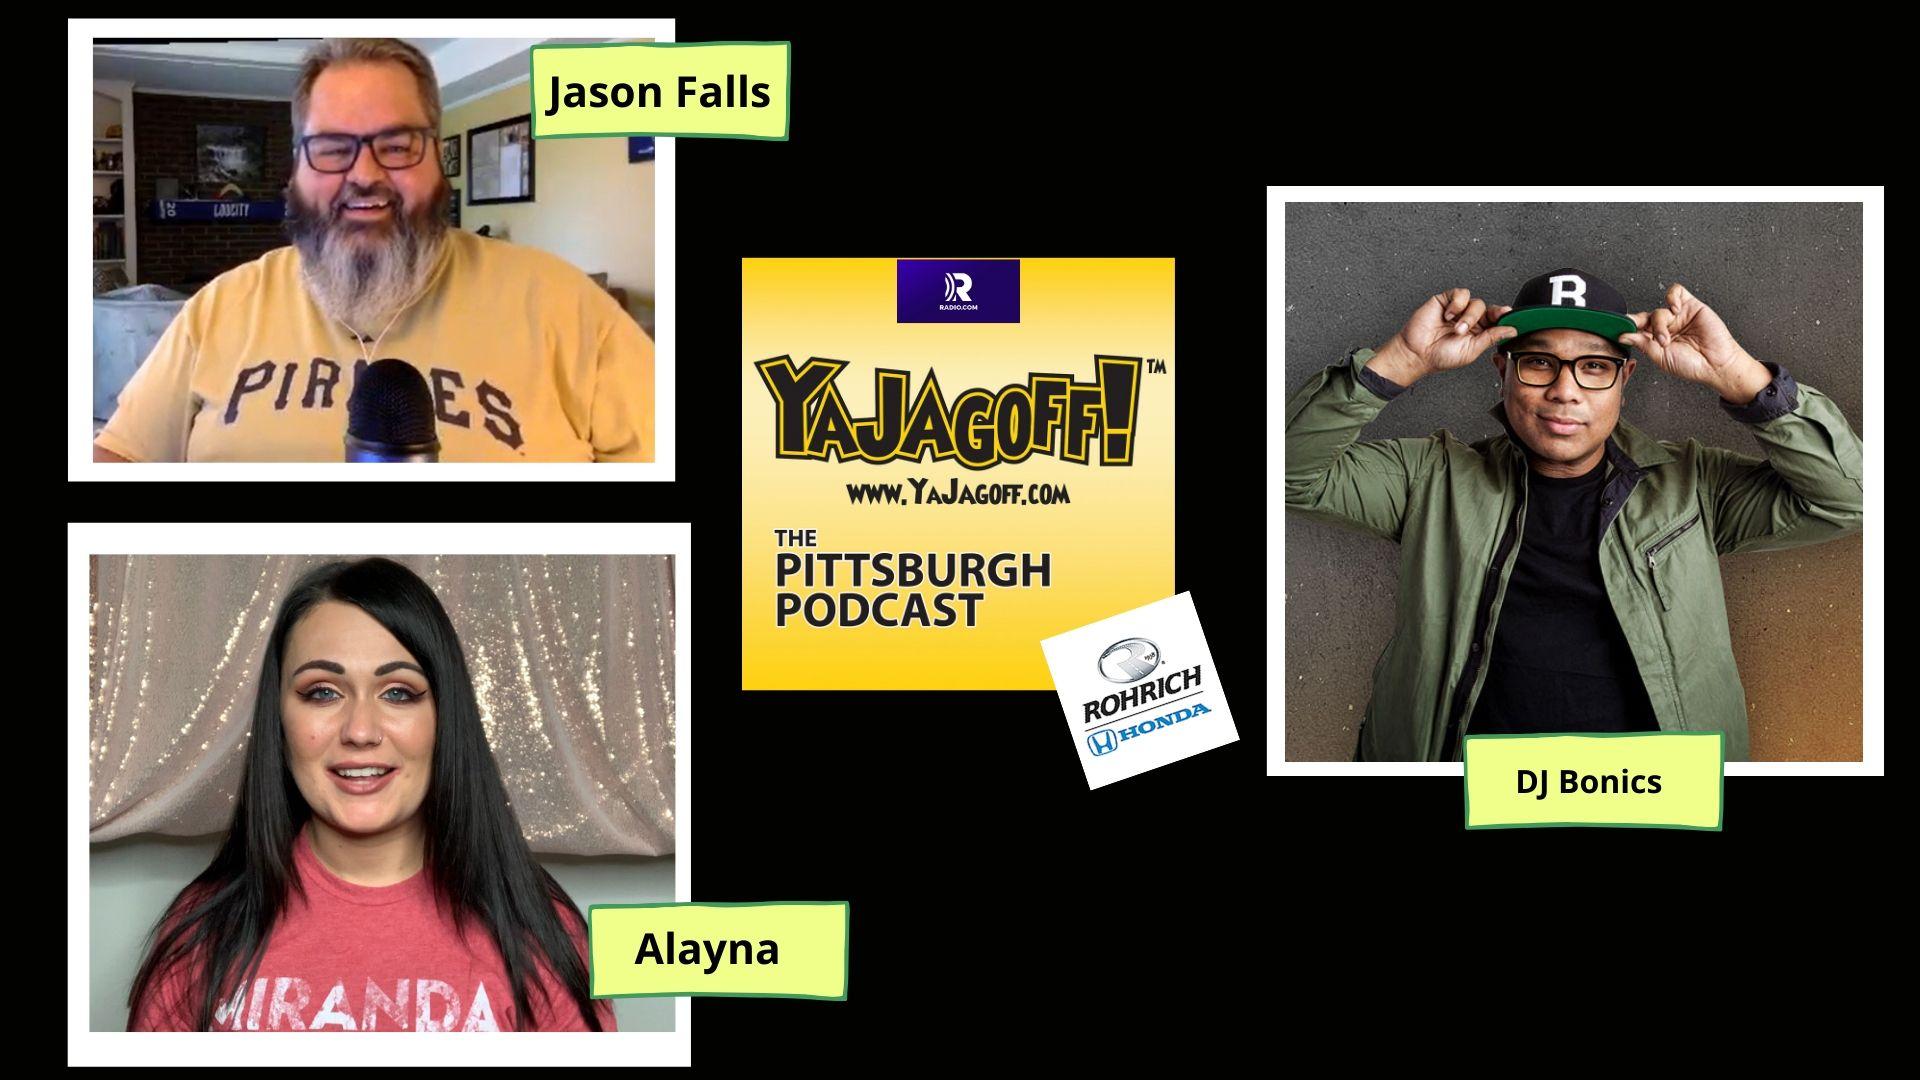 YaJagoff Podcast - Jason Falls and DJ Bonics